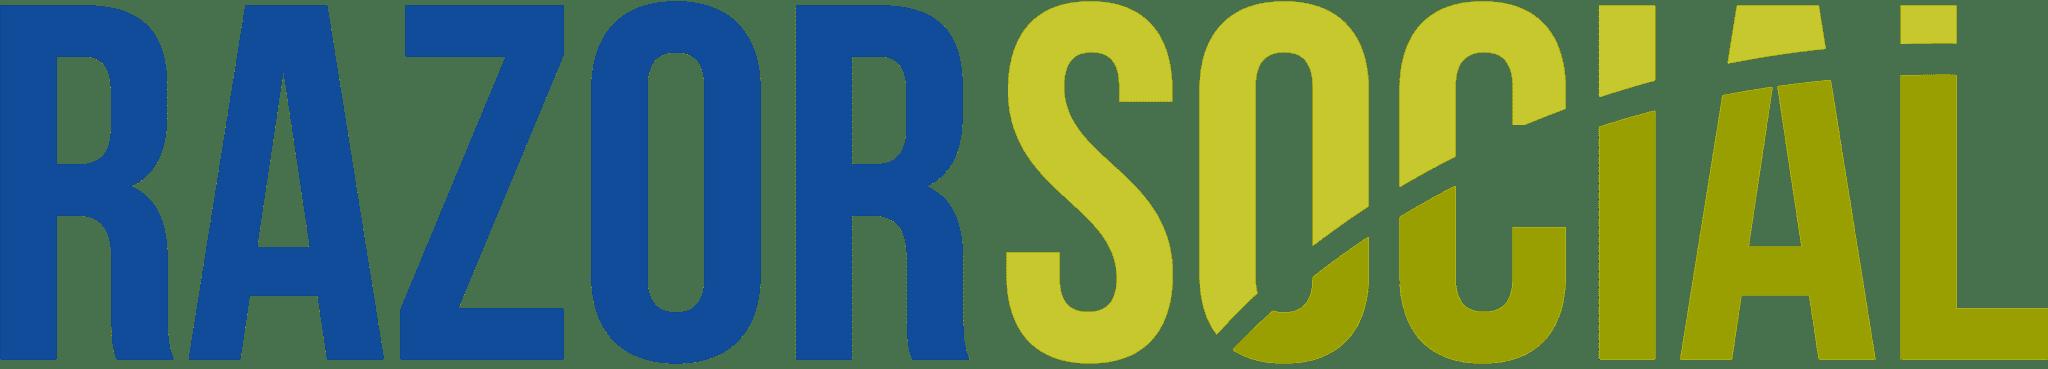 Razor Social Social Media Blog